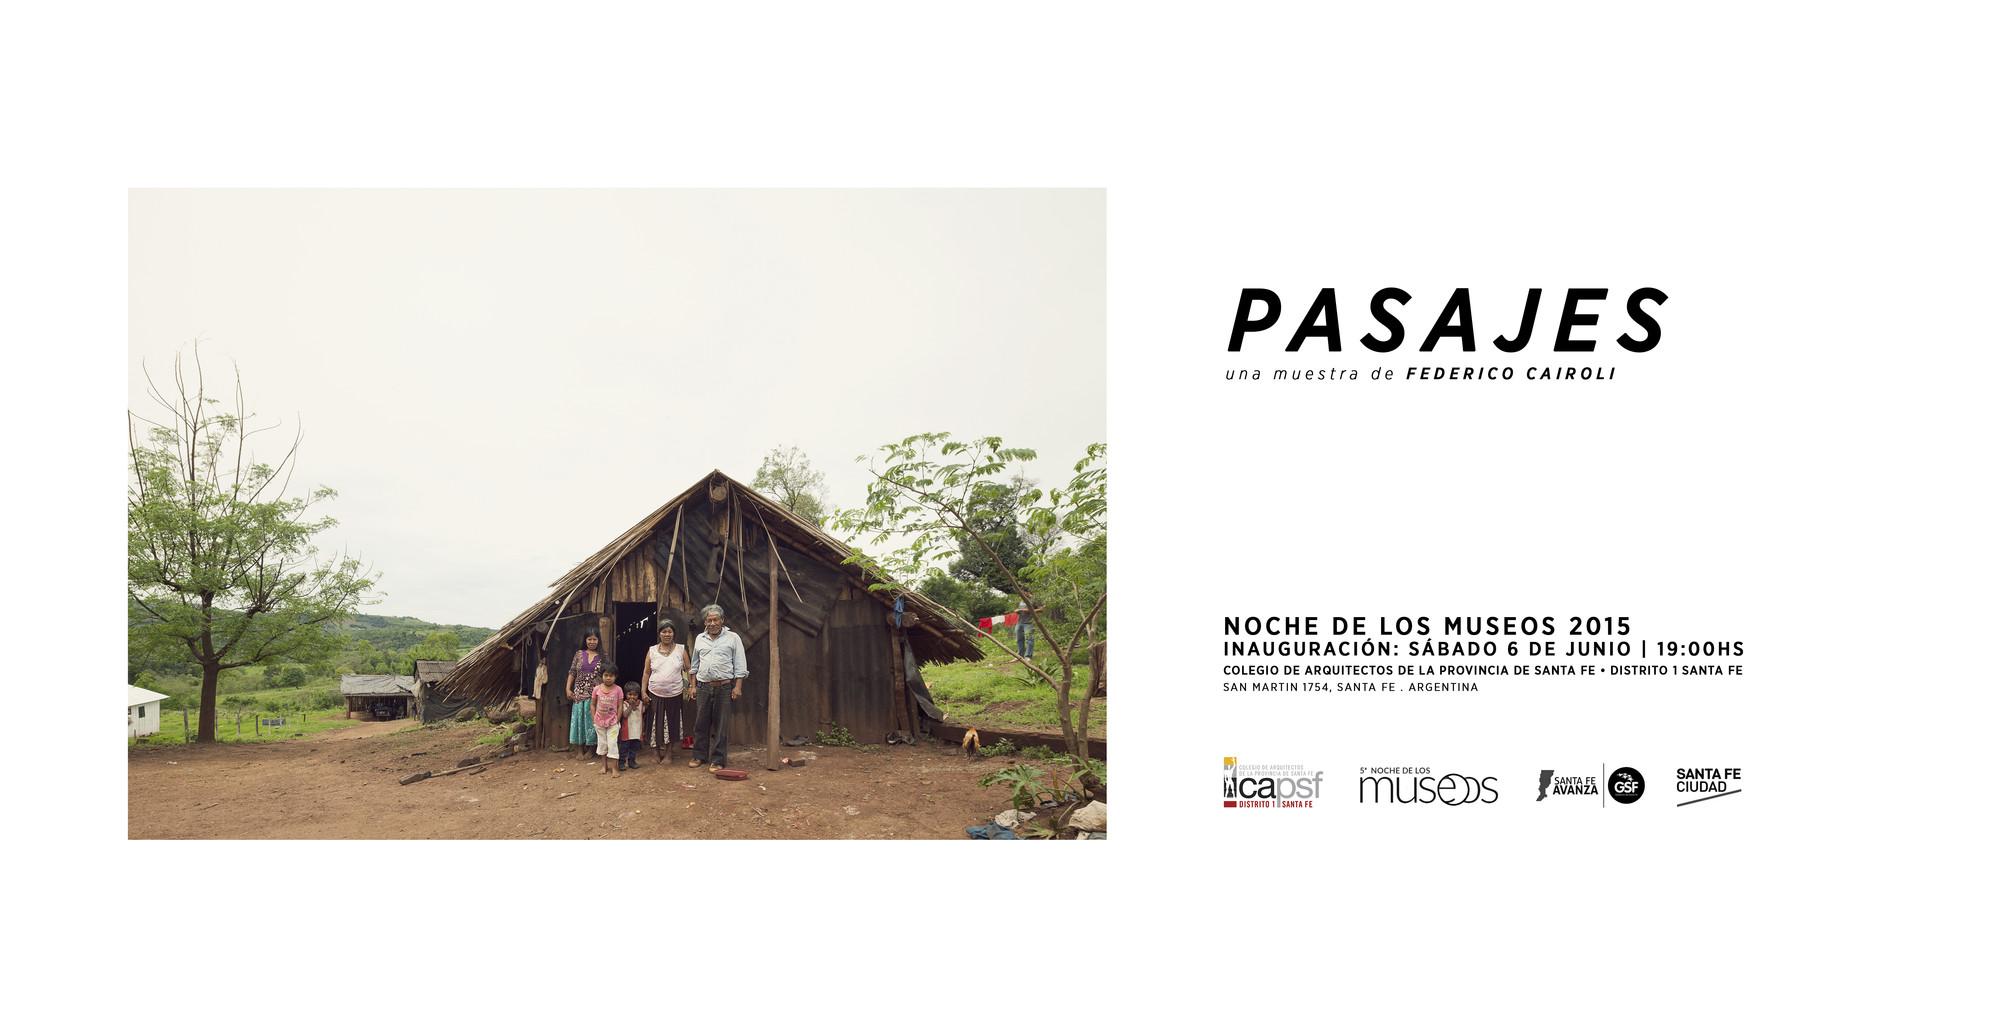 PASAJES, una muestra de Federico Cairoli / Santa Fe, Argentina